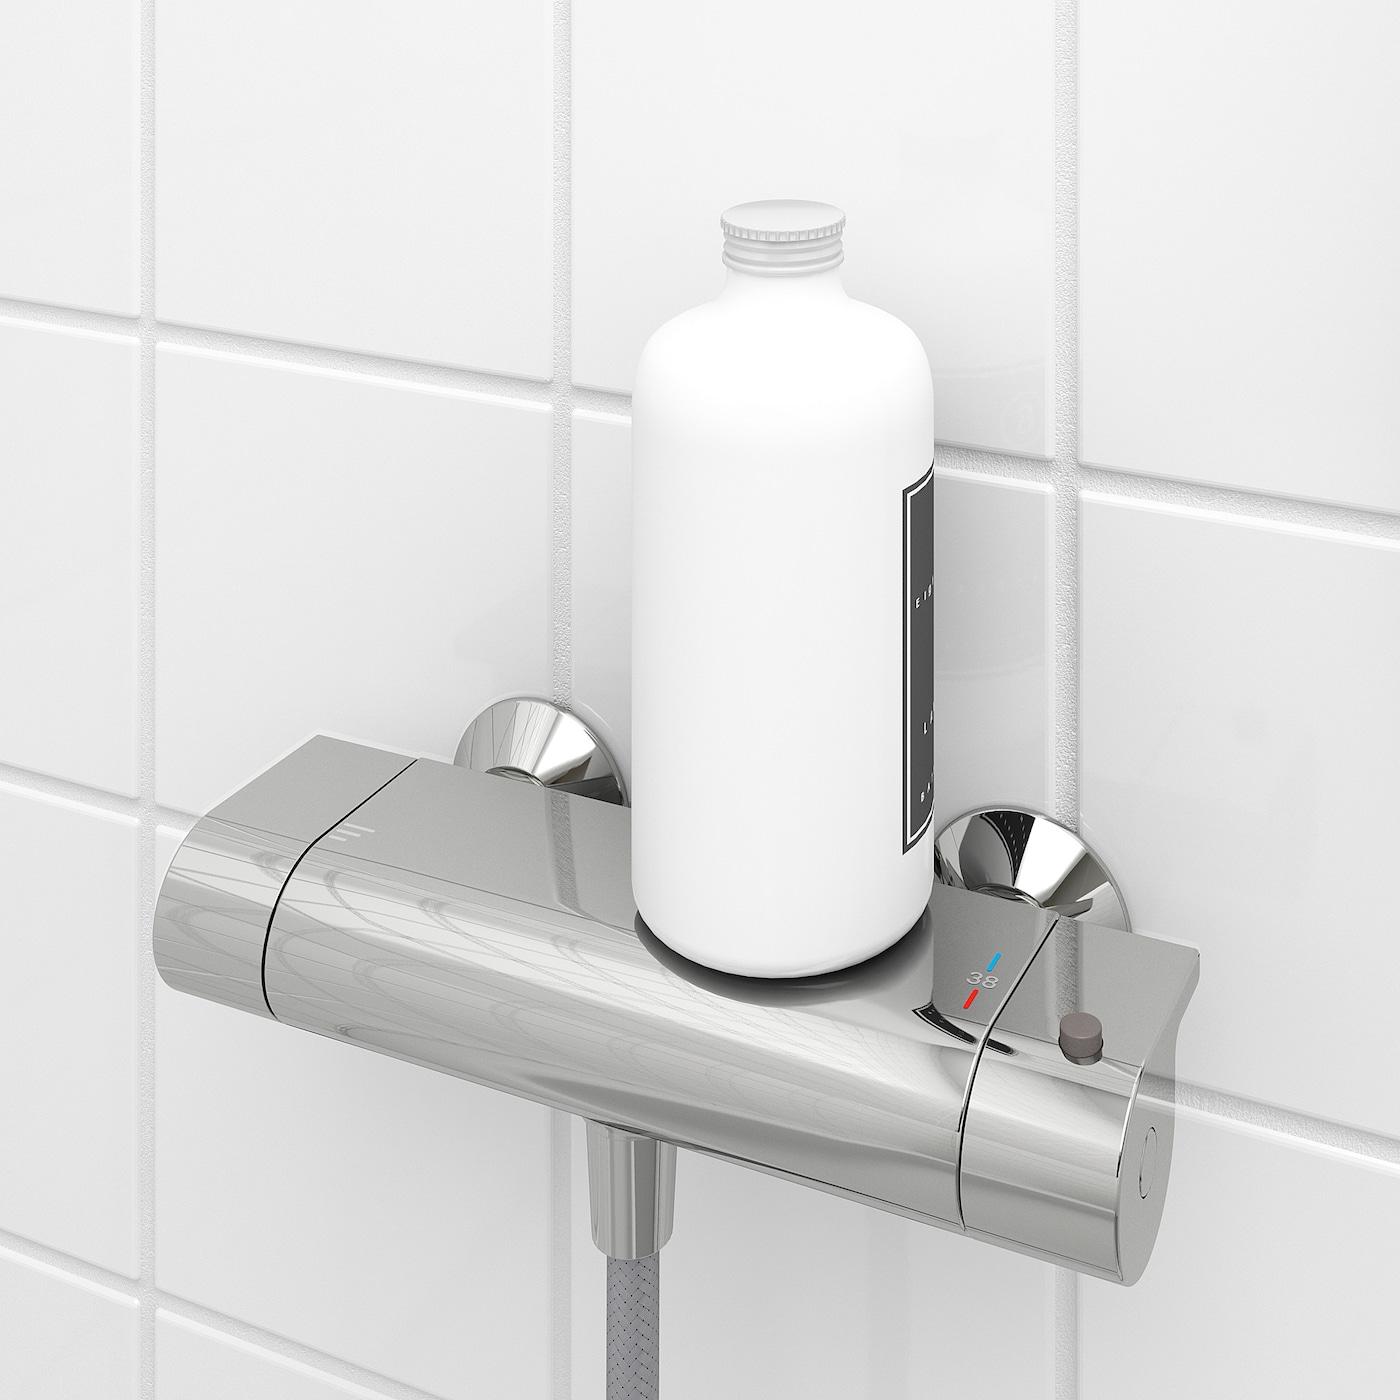 VALLAMOSSE Mezclador termostato ducha cromado 150 mm